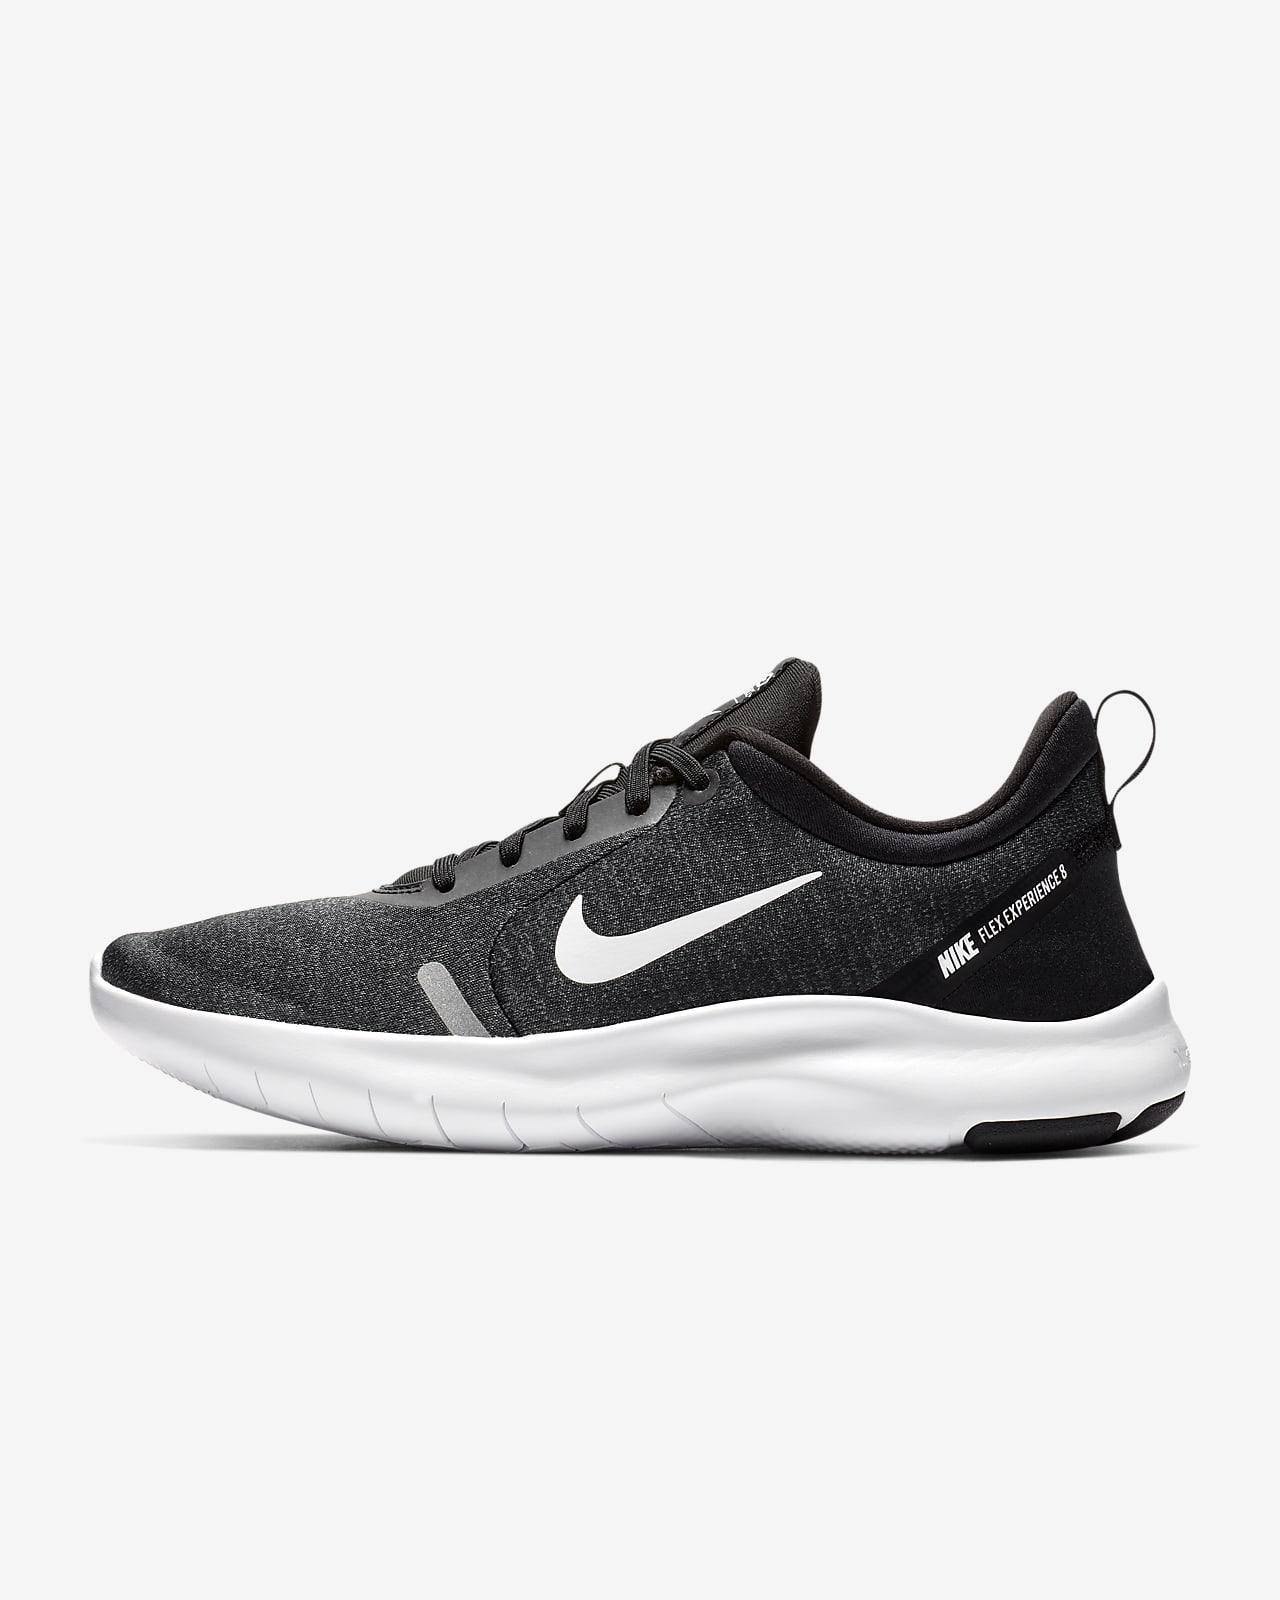 Lírico Horror pacífico  Calzado de running para mujer Nike Flex Experience RN 8. Nike.com